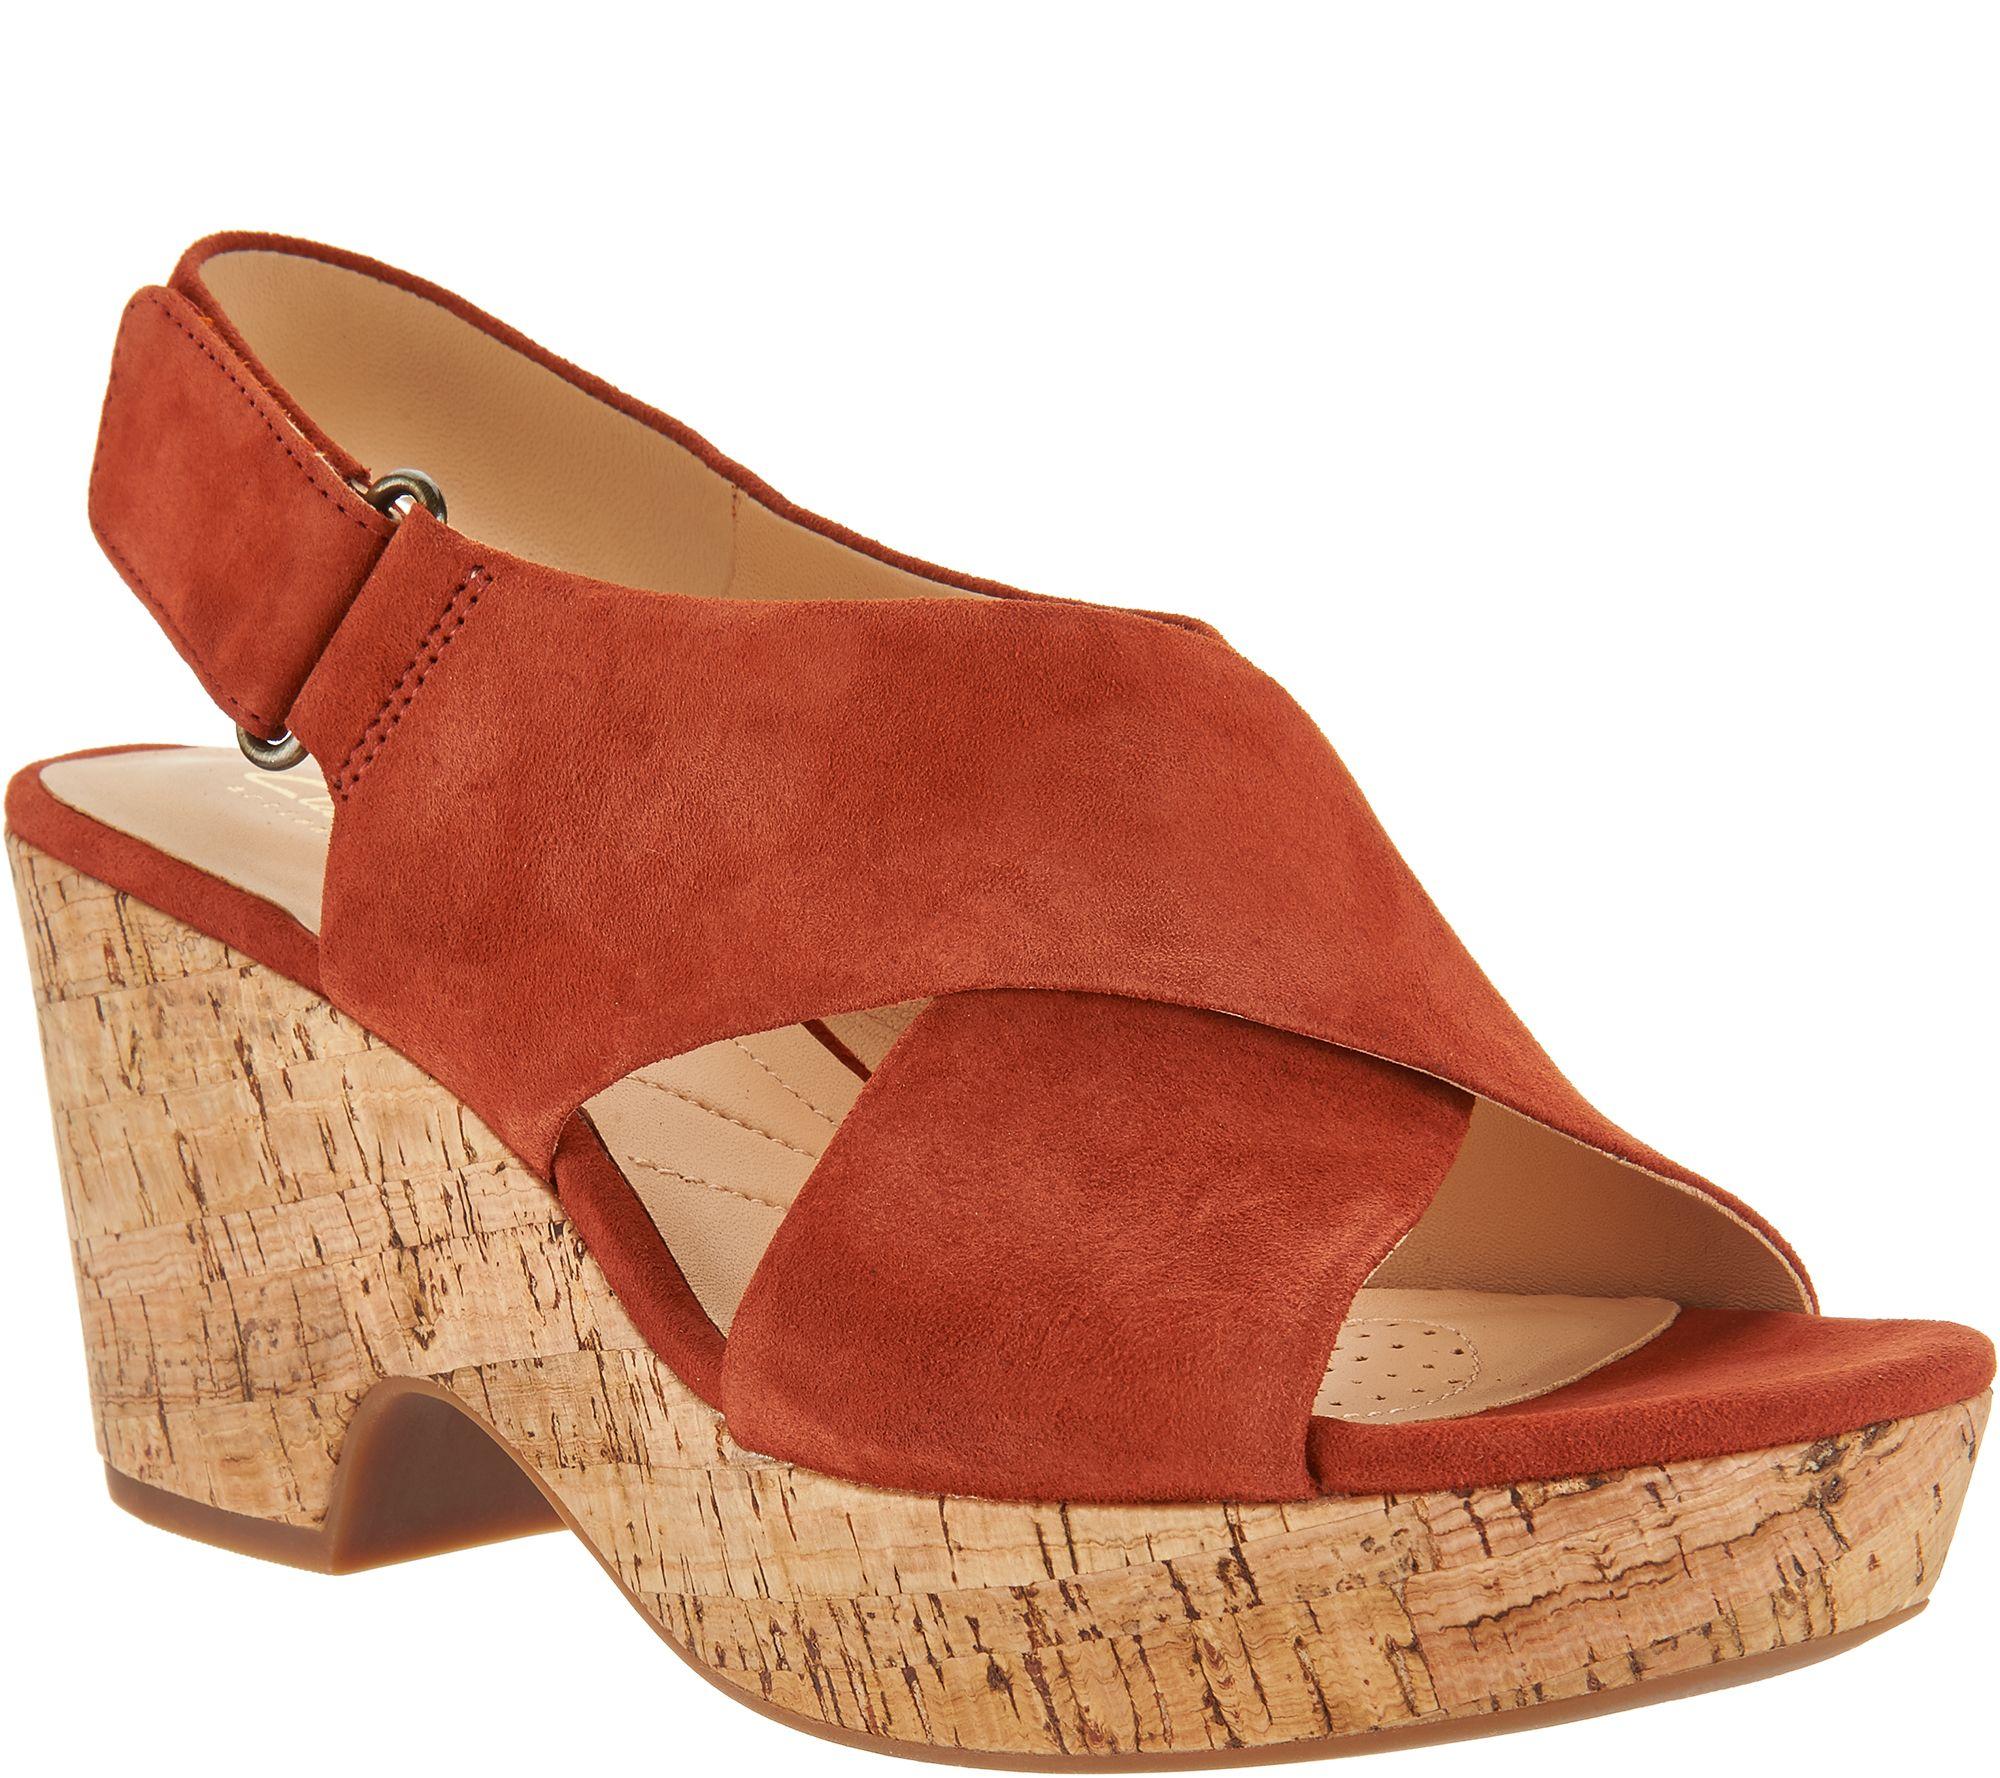 49367ef59338 Clarks Artisan Leather Adjustable Wedge Sandals - Maritsa Lara - Page 1 —  QVC.com